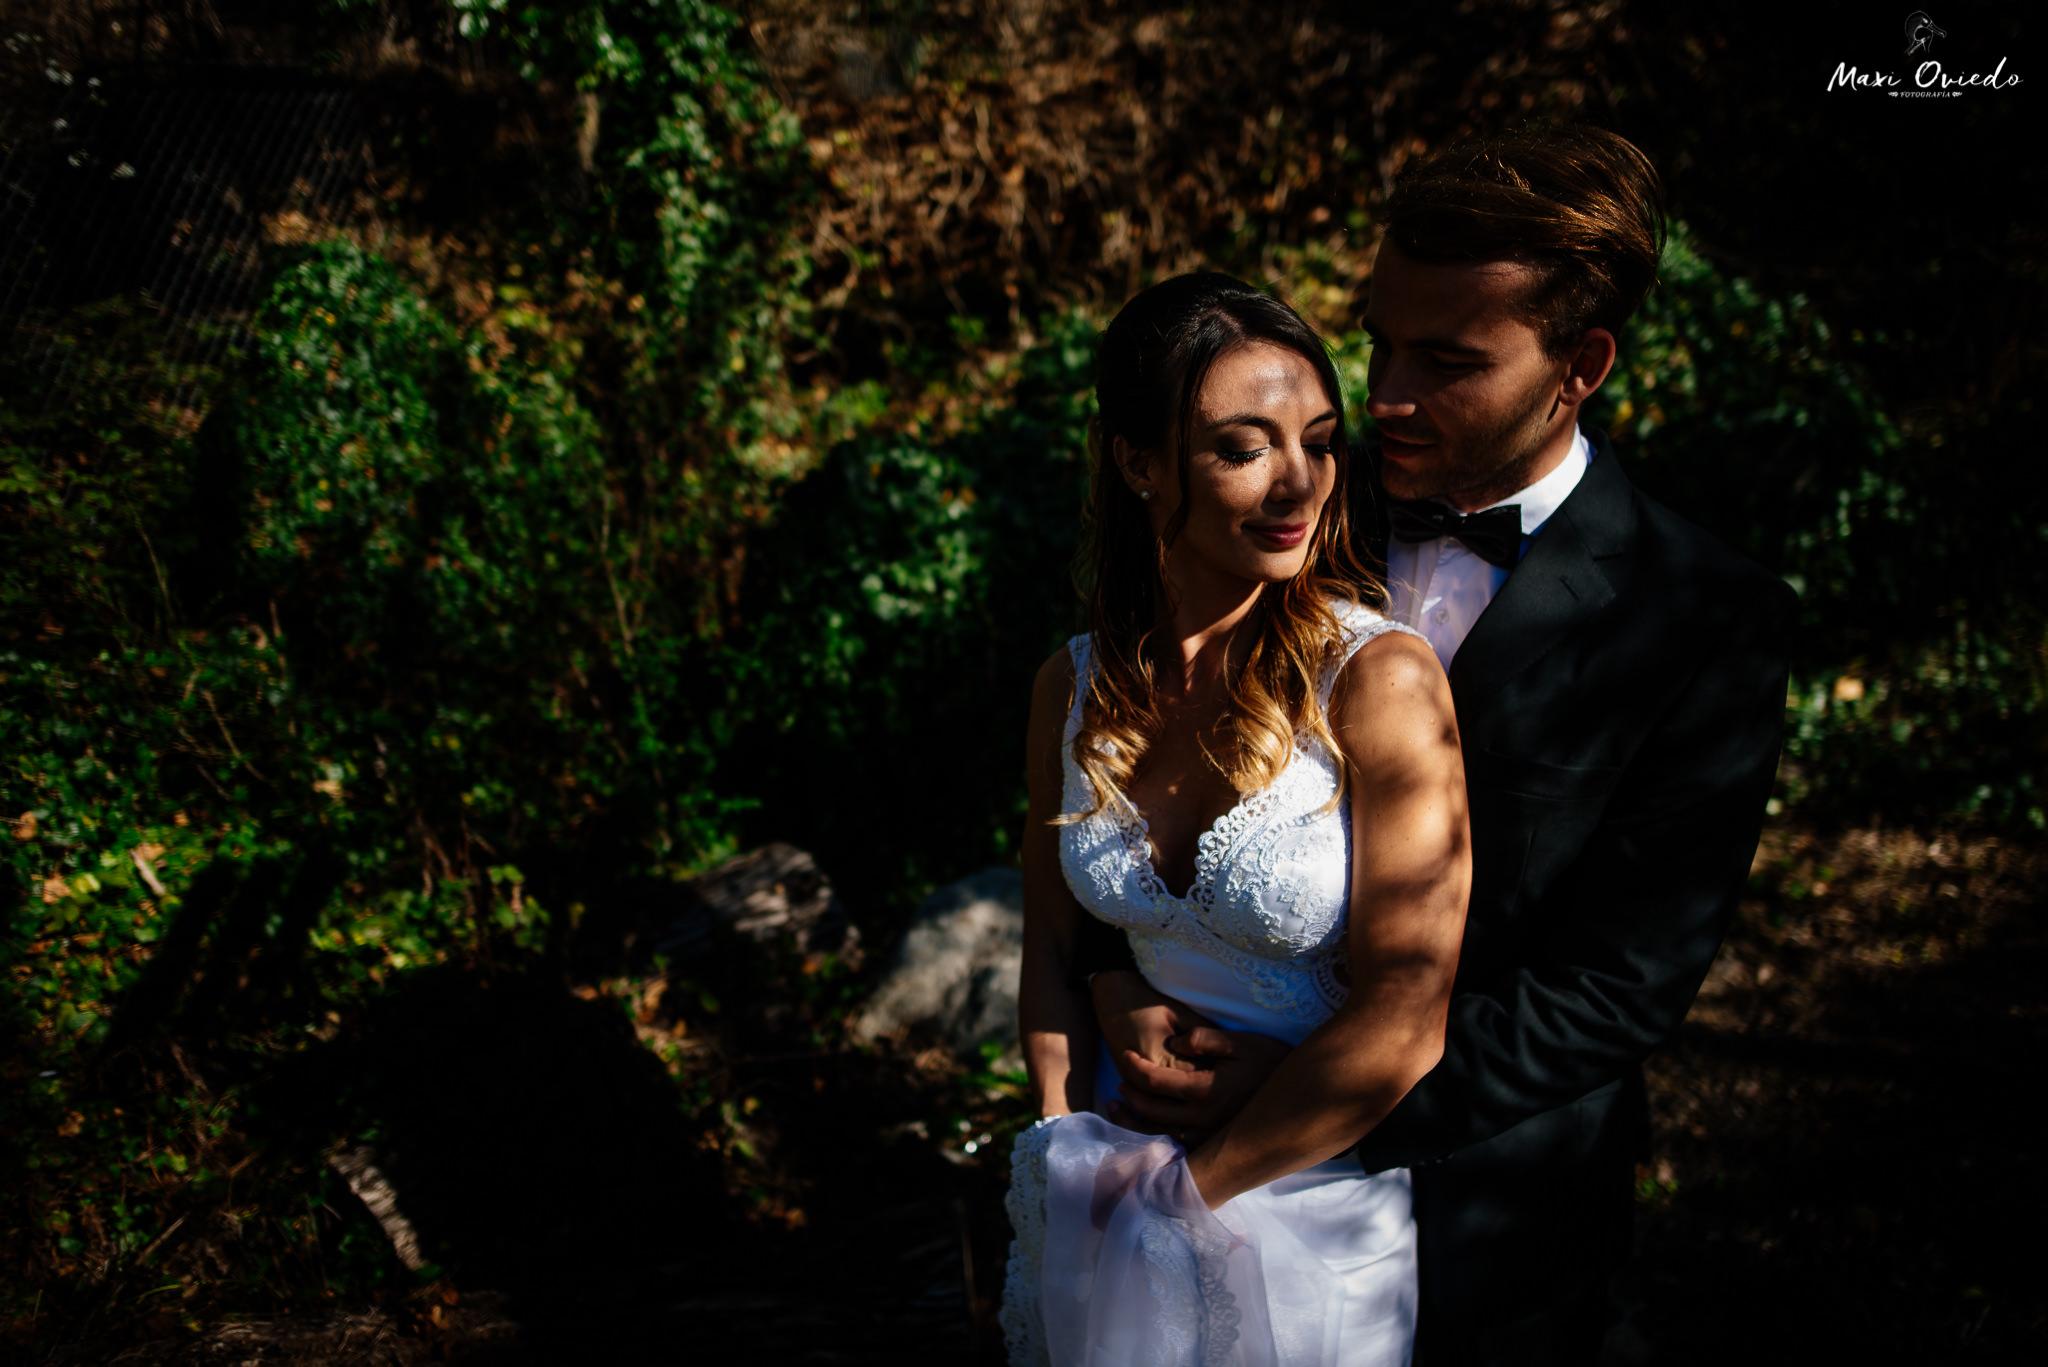 boda sextuple la cumbre cordoba cuchi corral fotografo de bodas fotografo de casamientos rosario san nicolas argentina vestido de novia ramo de novia-9.jpg